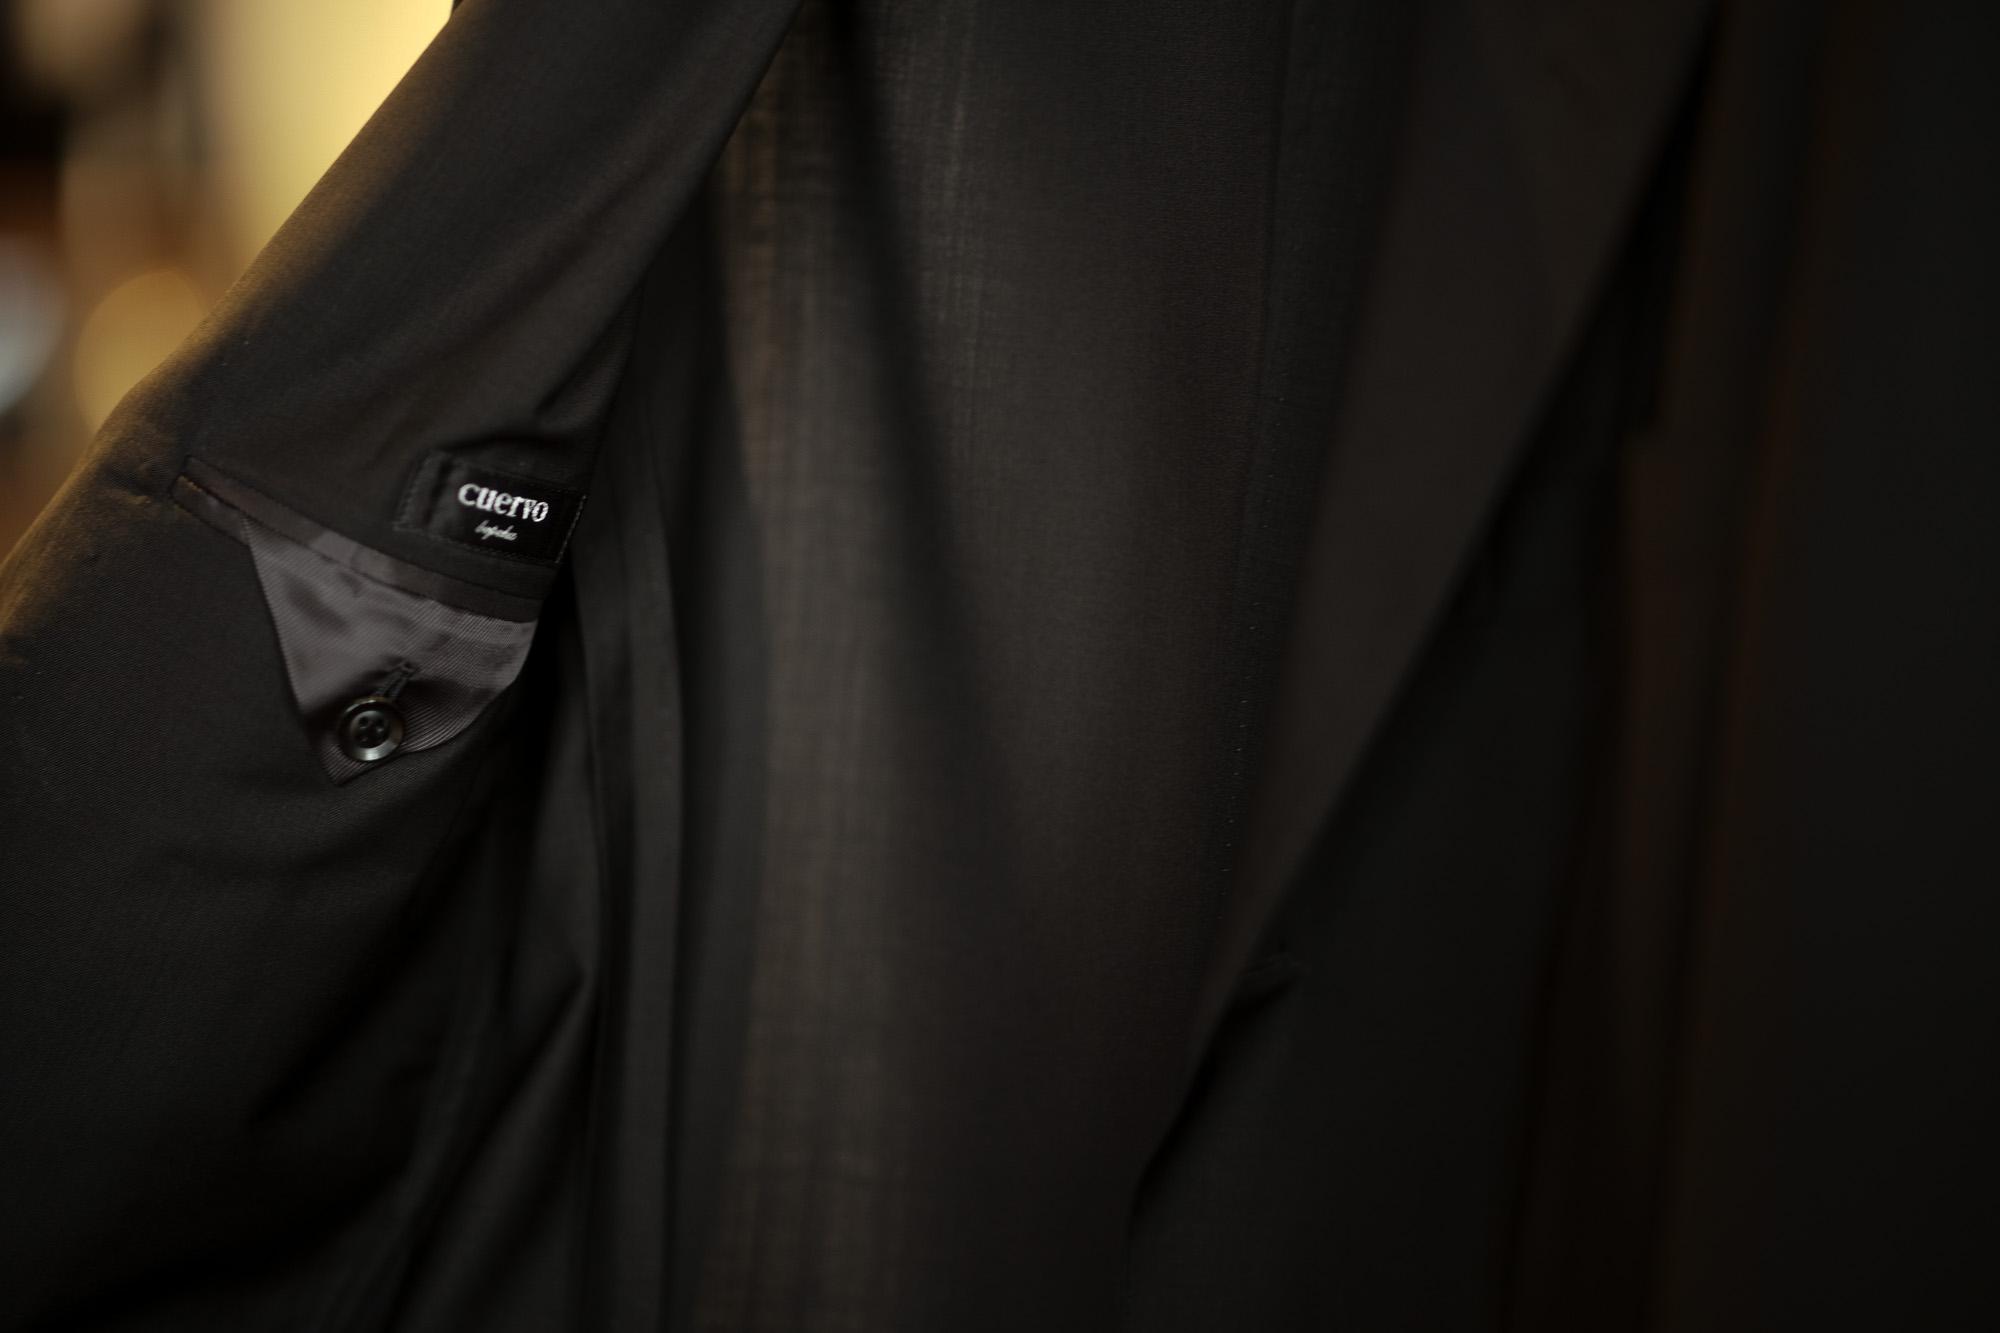 "cuervo bopoha ""Lobb"" Summer Wool BLACK,NAVY 2021SS  クエルボ ヴァローナ ロブ サマーウール ジャケット ブラック MADE IN JAPAN 日本製 愛知 名古屋 Alto e Diritto altoediritto アルトエデリット サマージャケット ブラックジャケットネイビージャケット"